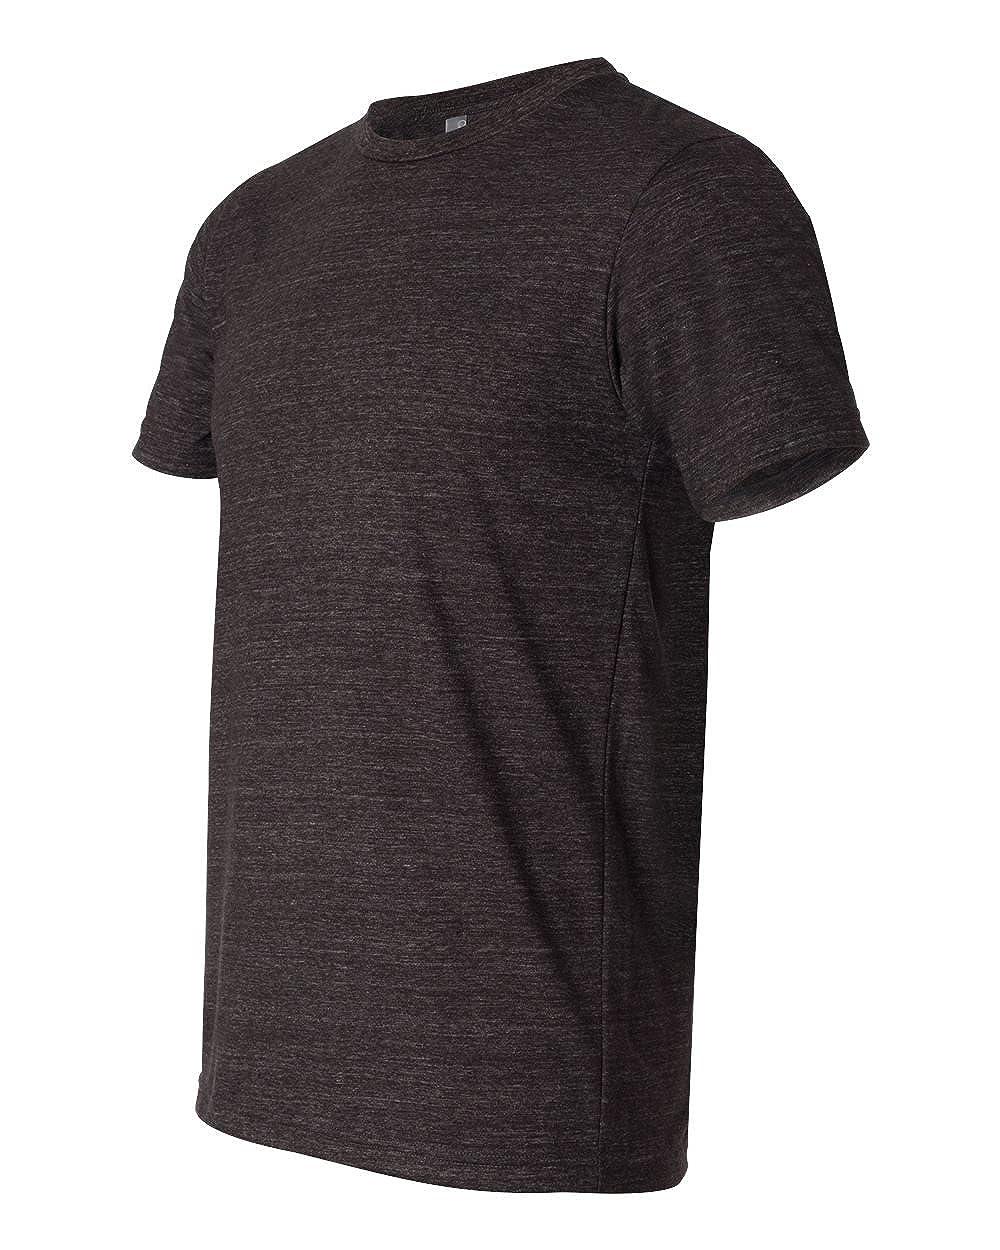 Bella Canvas Perfect Tri-Blend Fashionable T-Shirt